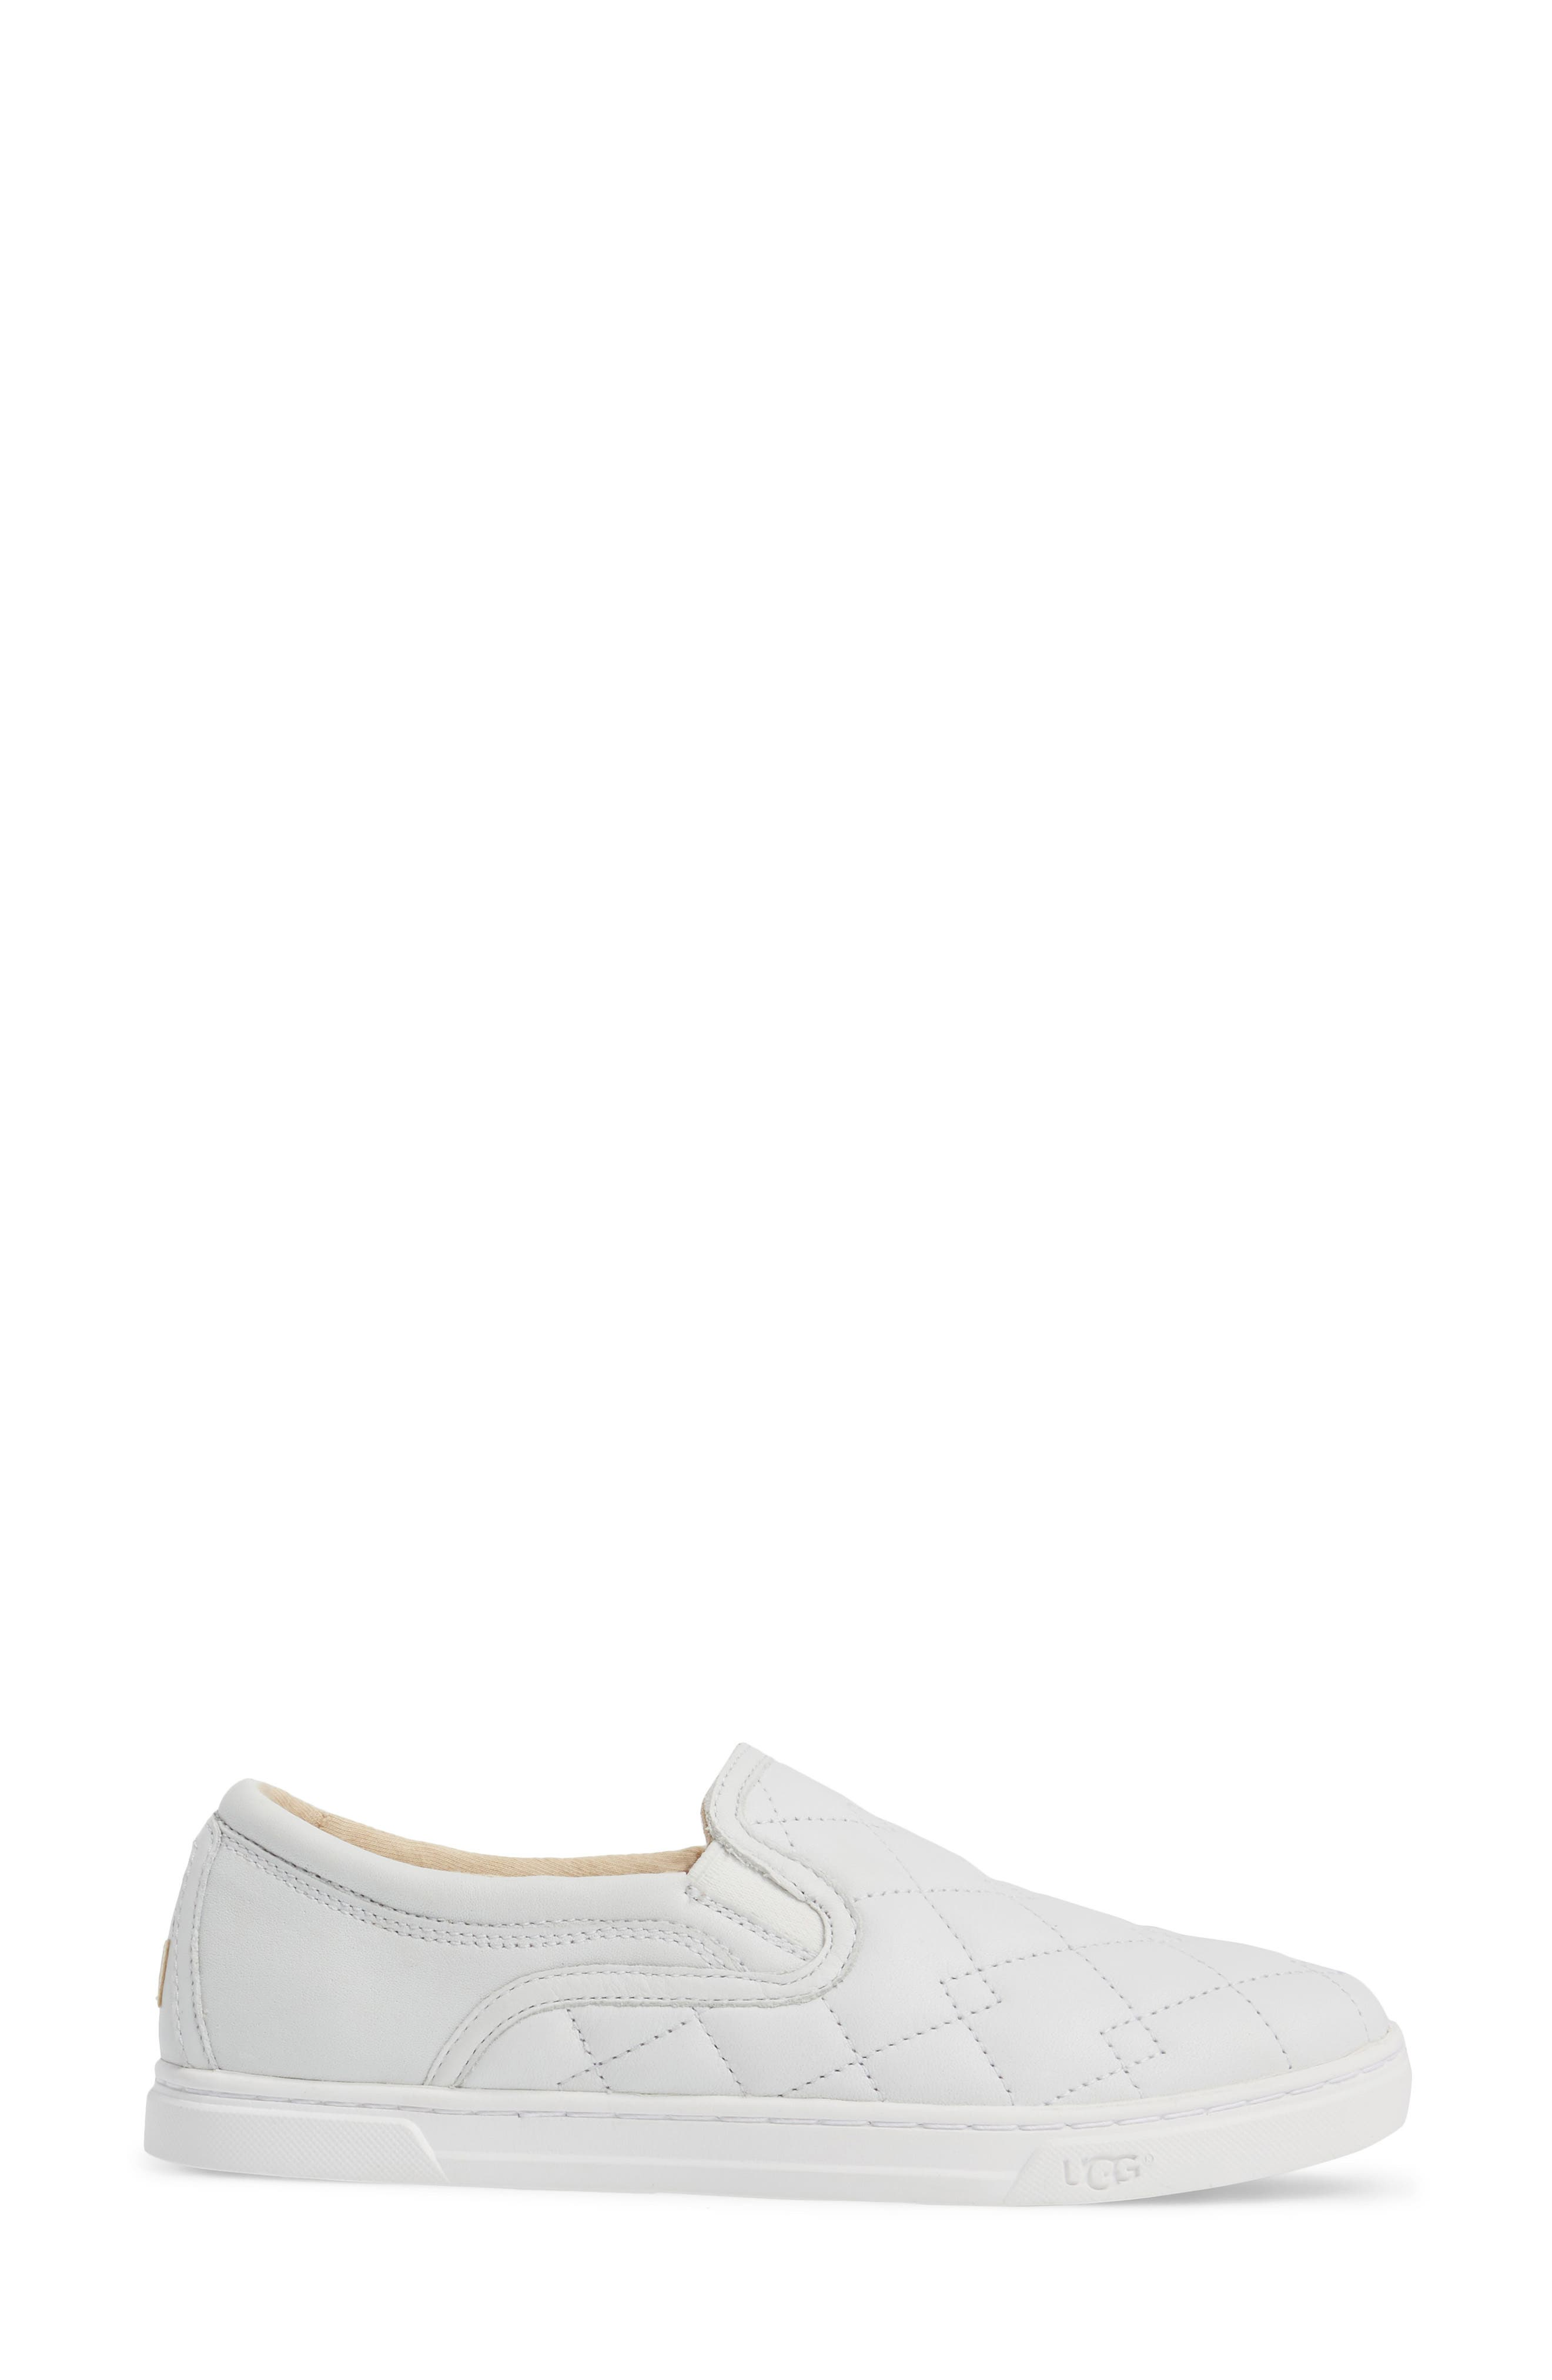 Alternate Image 3  - UGG® Fierce Deco Quilted Slip-On Sneaker (Women)